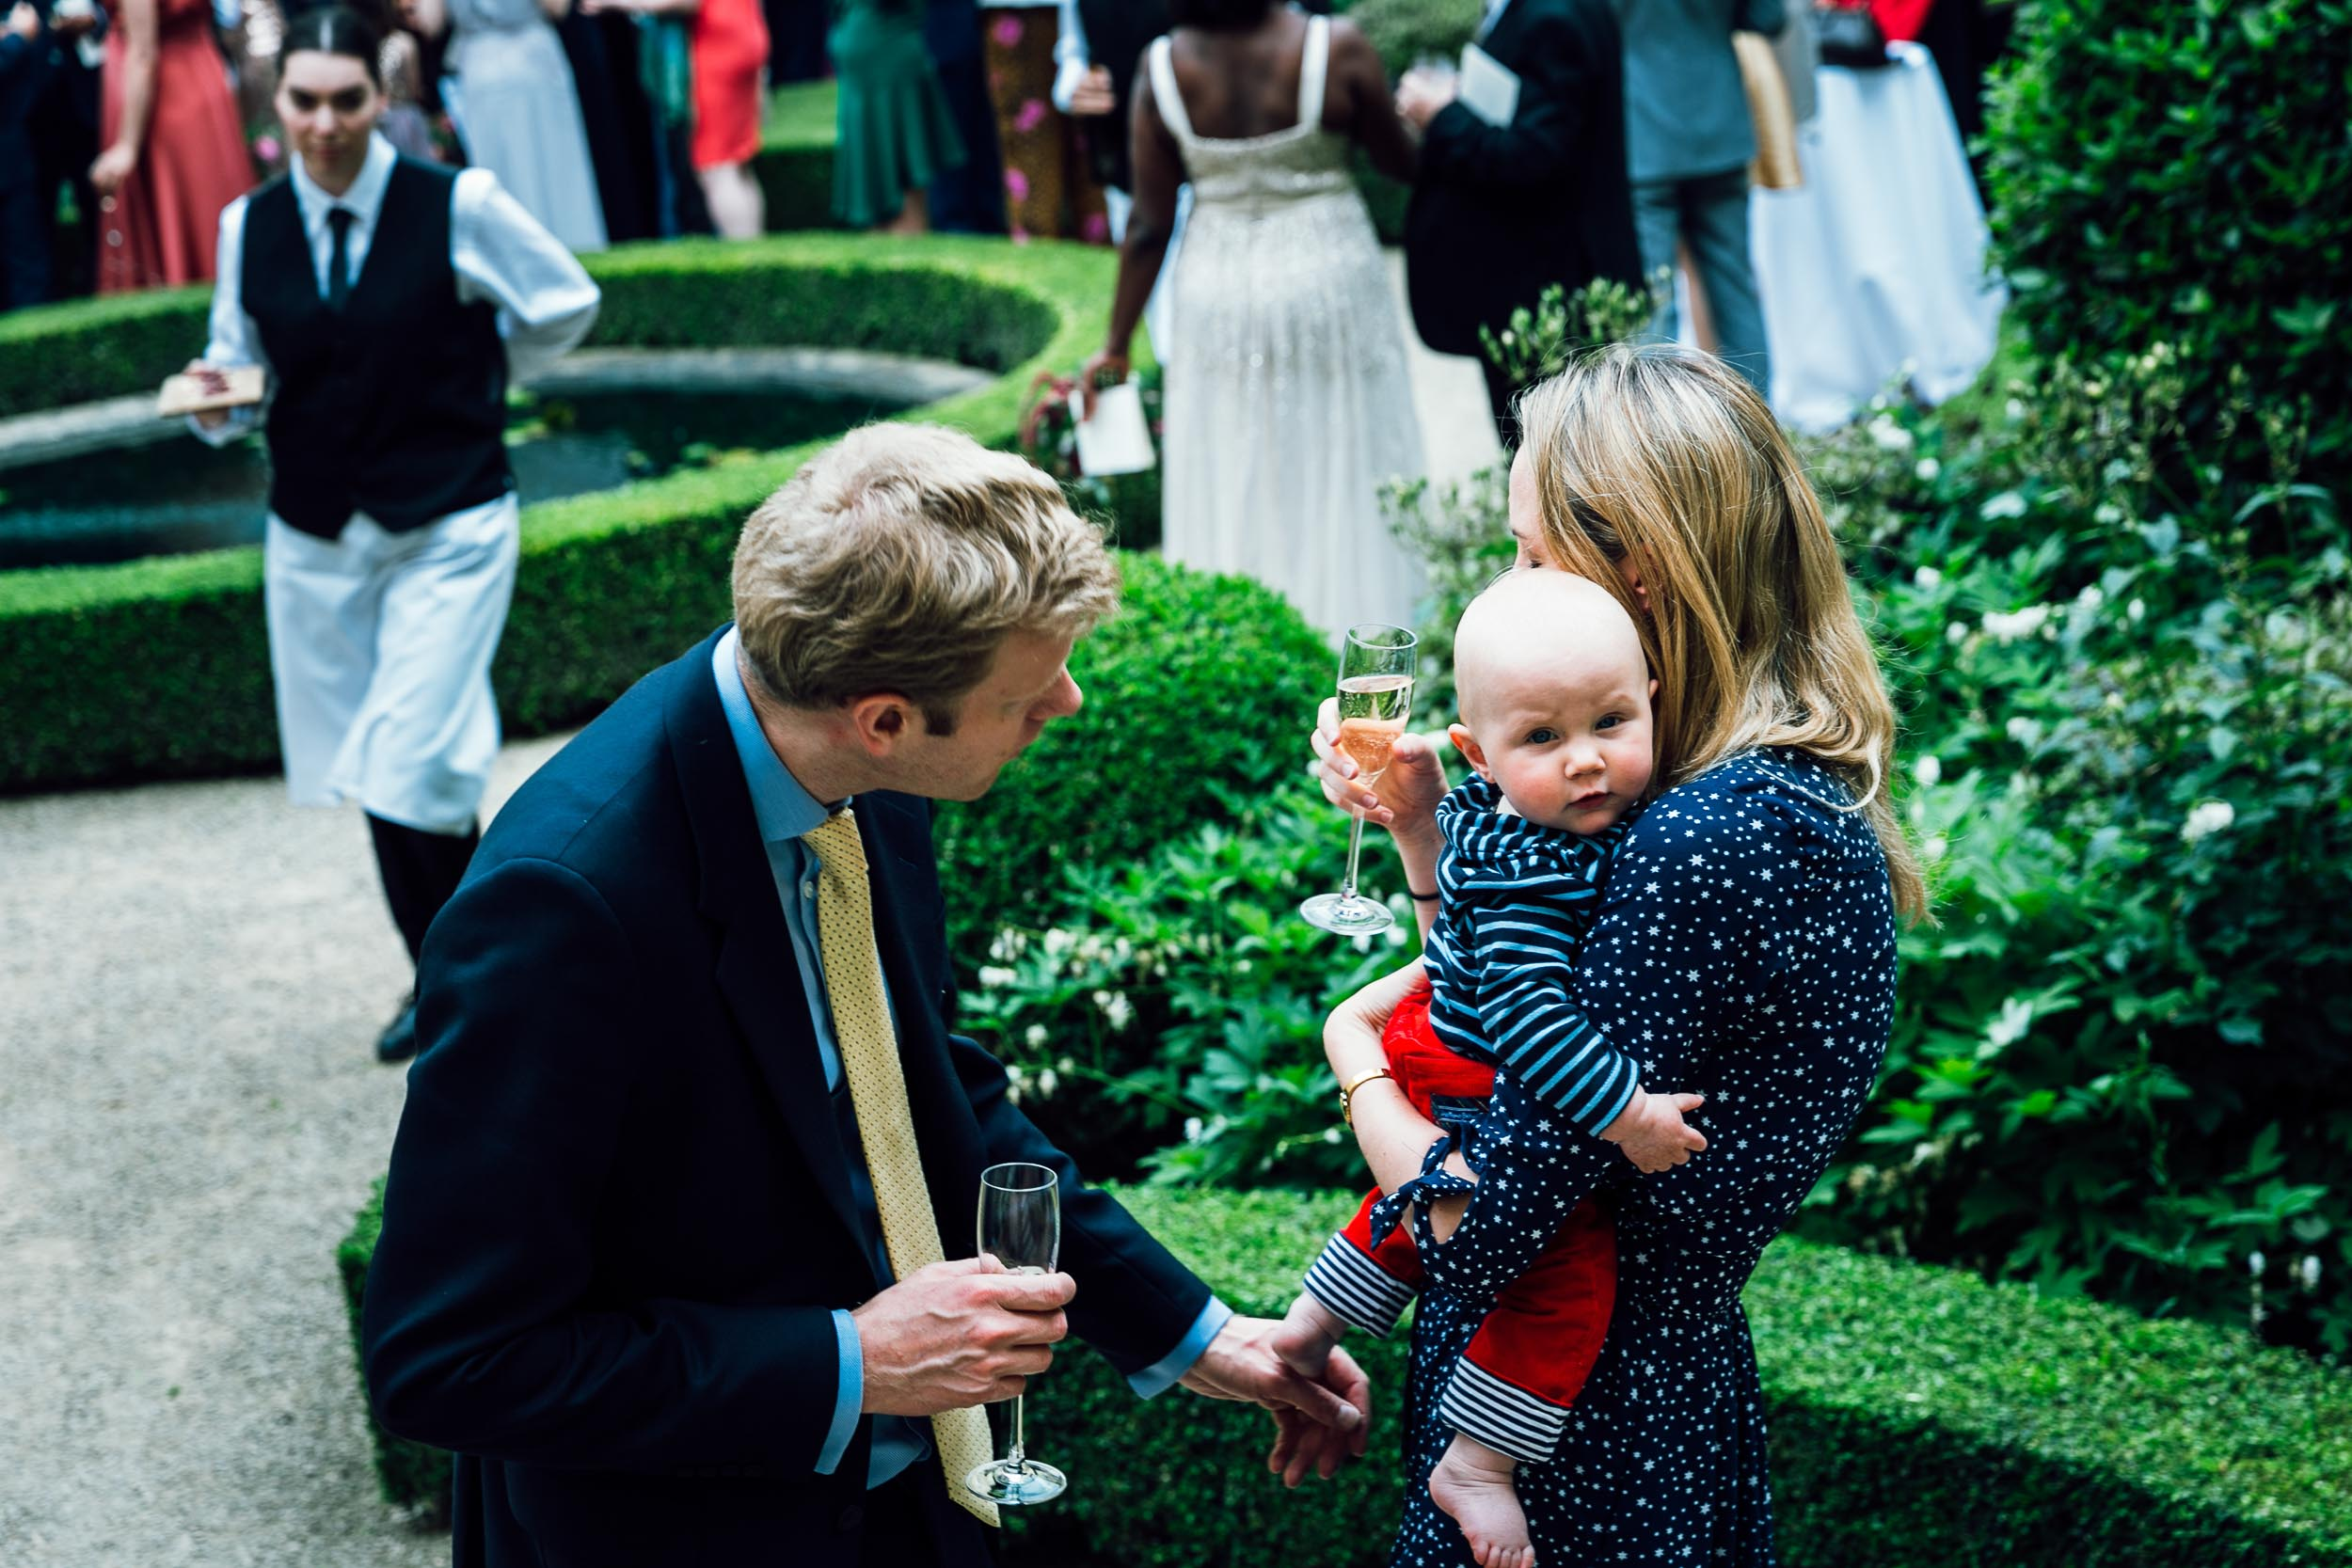 syon-house-wedding-photographer-london 082.jpg